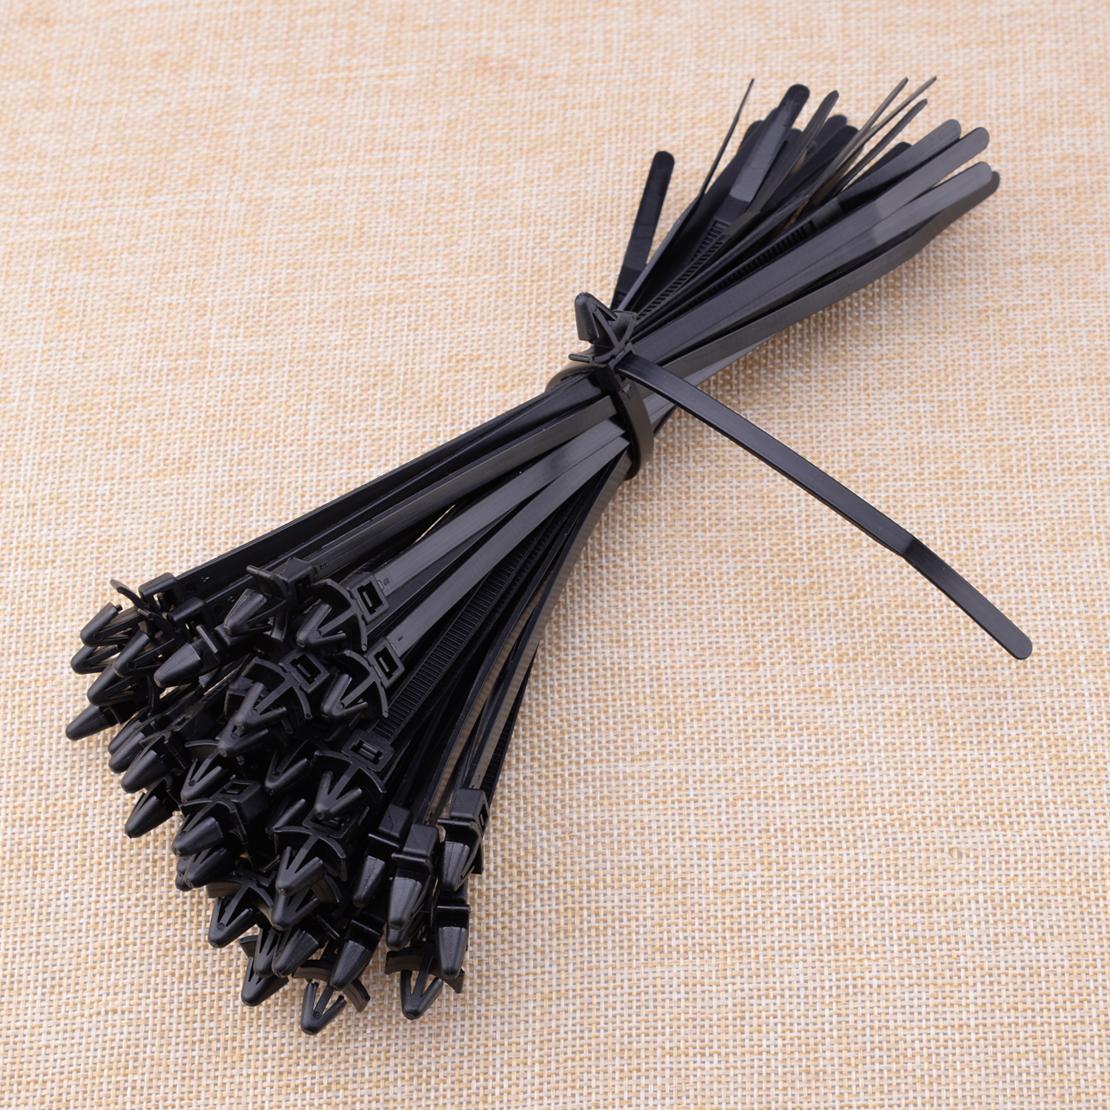 50pcs 200mm Car Nylon Cable Strap Push Mount Wire Tie Retainer Clip Clamp Black